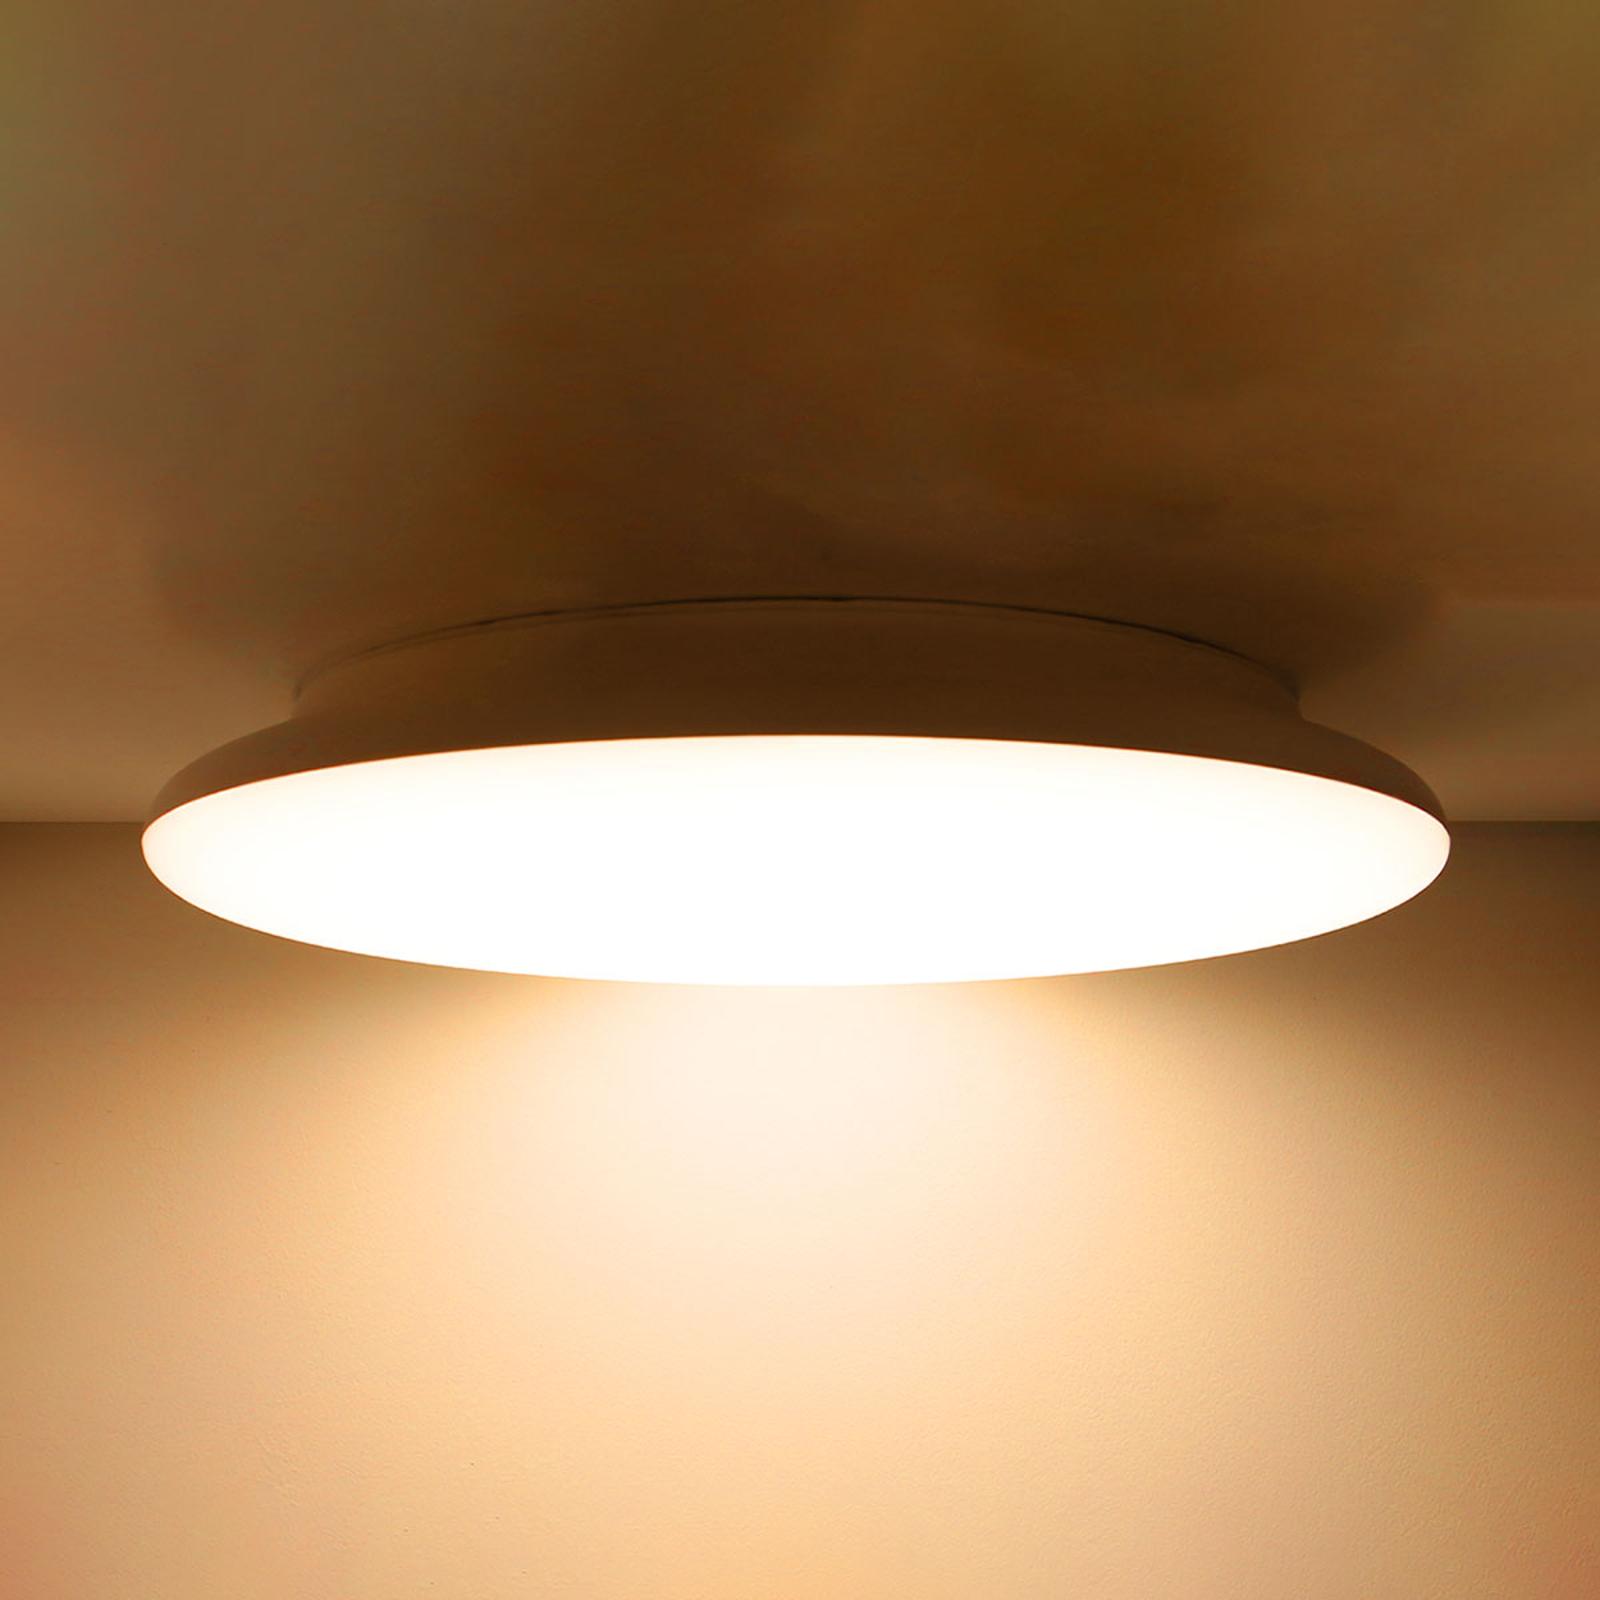 SLC LED-Deckenleuchte dimmbar IP54 Ø 25 cm 2.700K